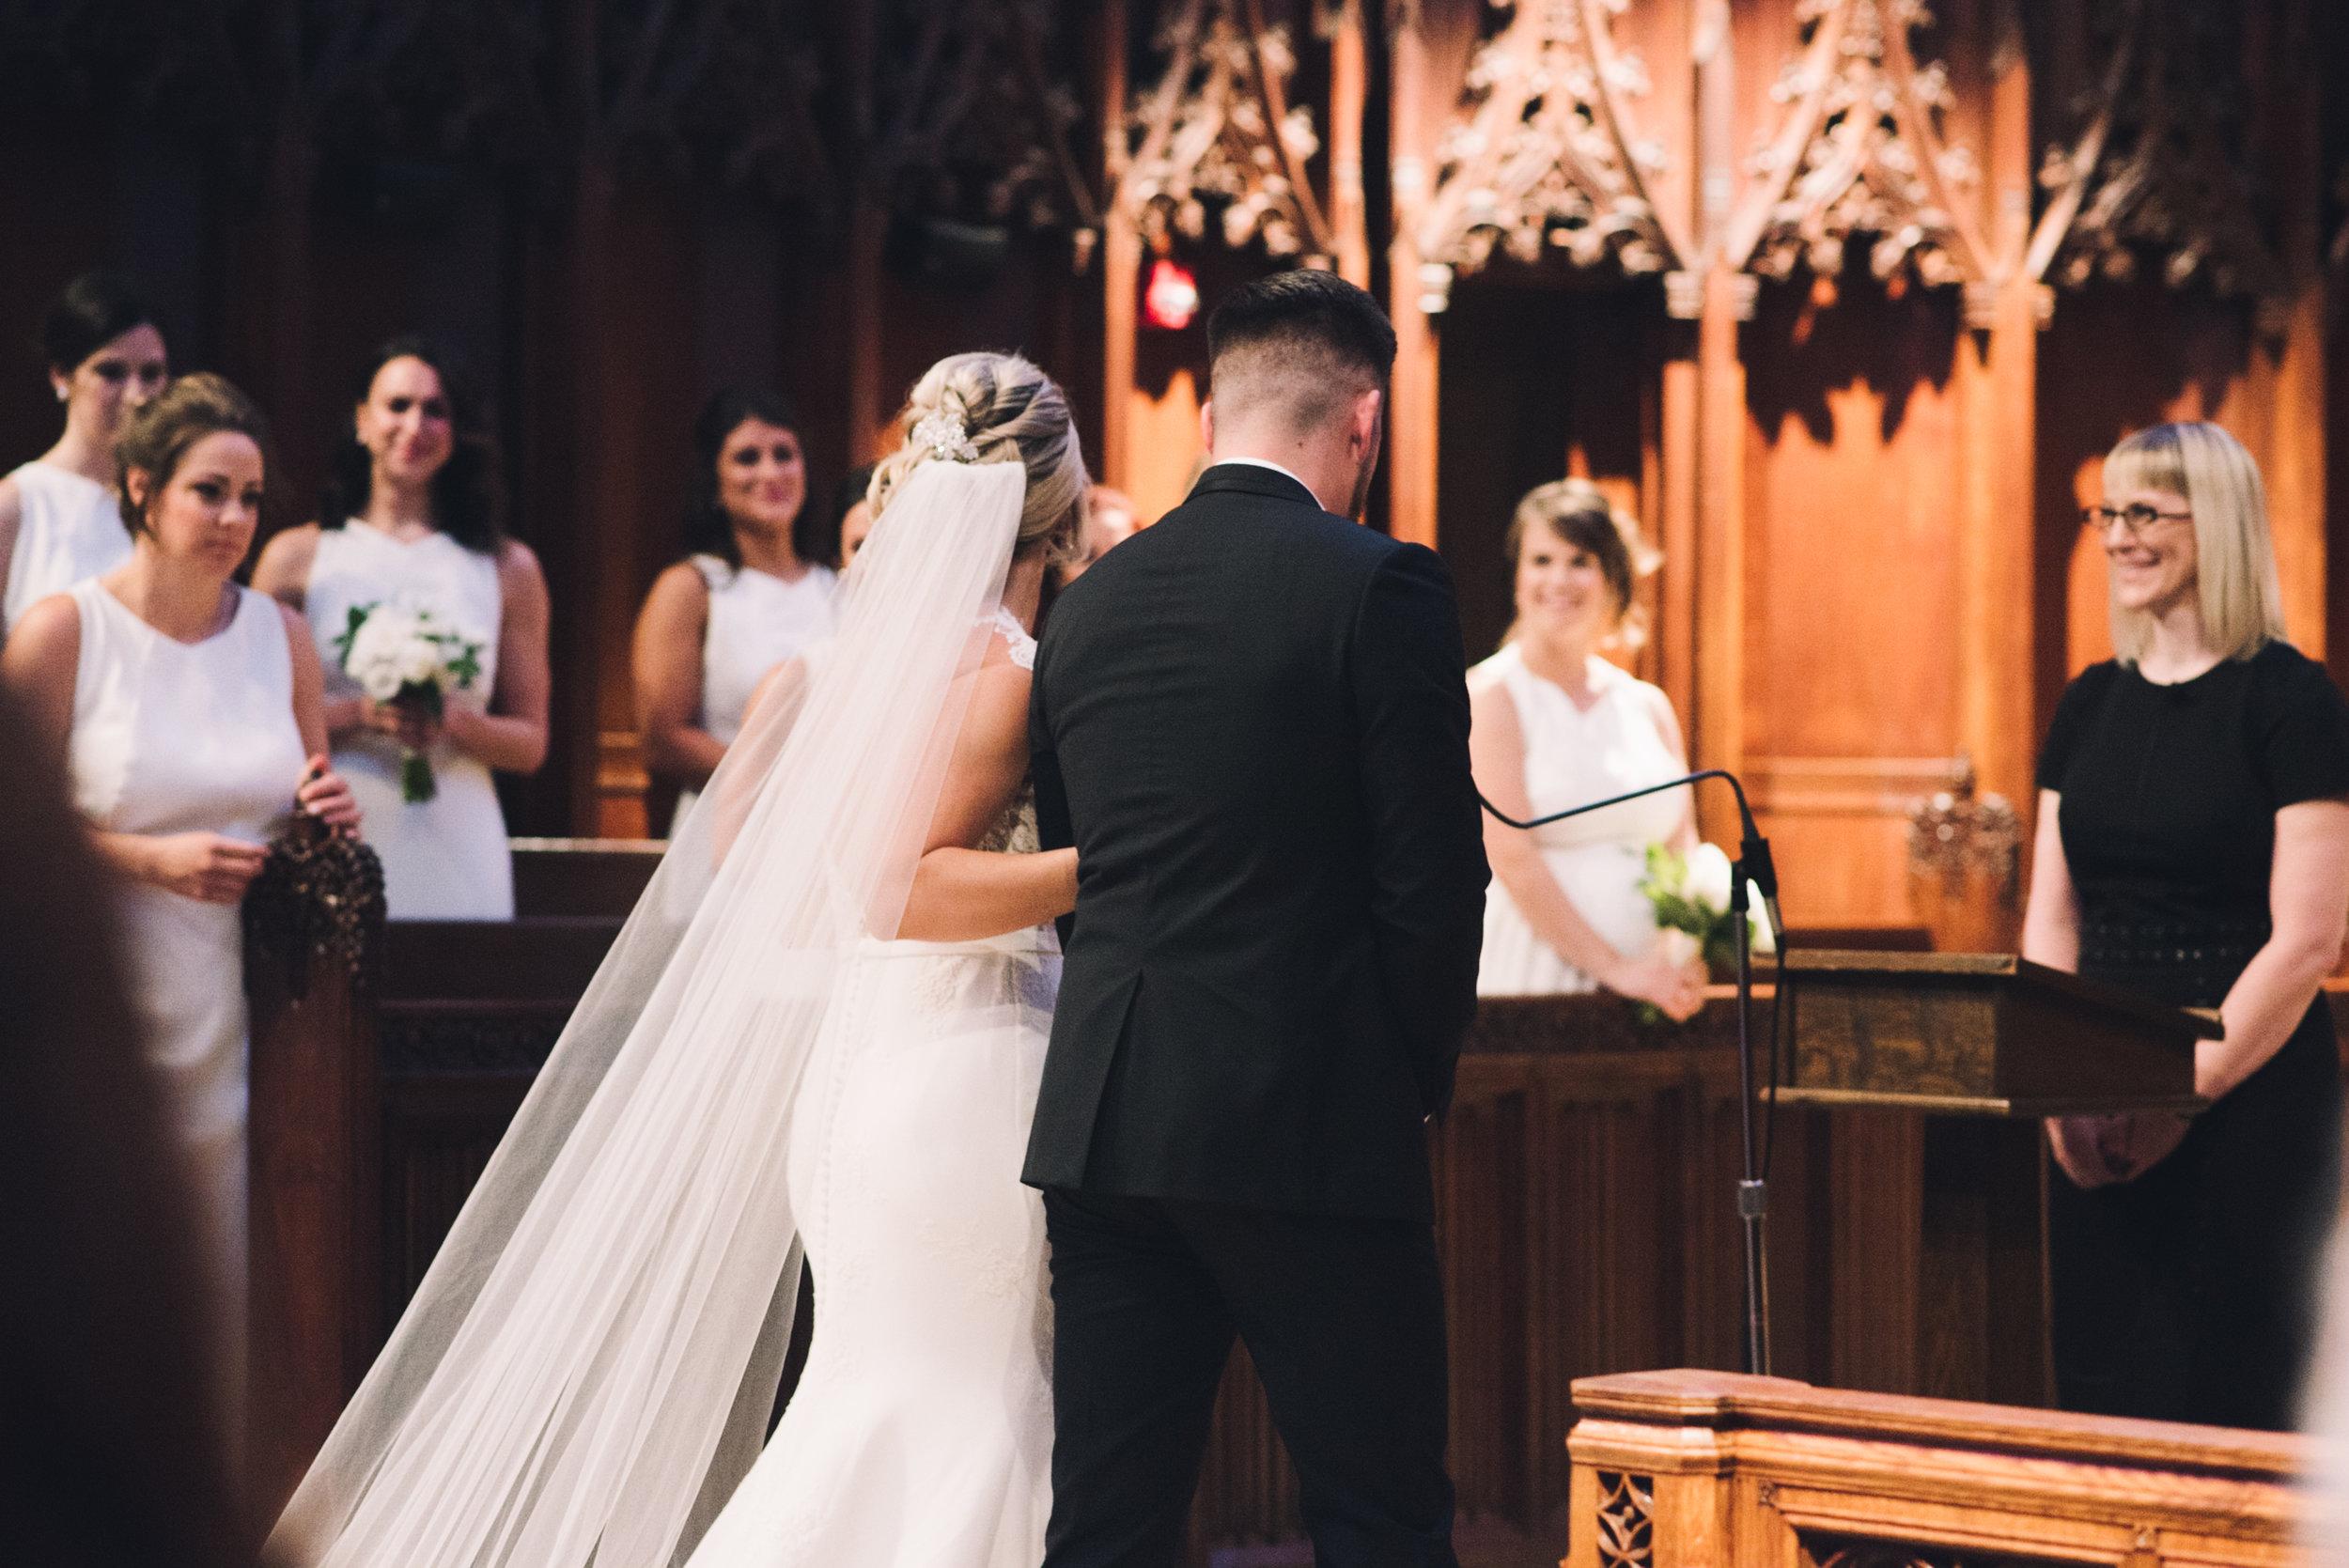 Pittsburgh Pennsylvania New York NYC Wedding Photographer Photojournalist Luxury Downtown Opera - Stirpe 668.jpg